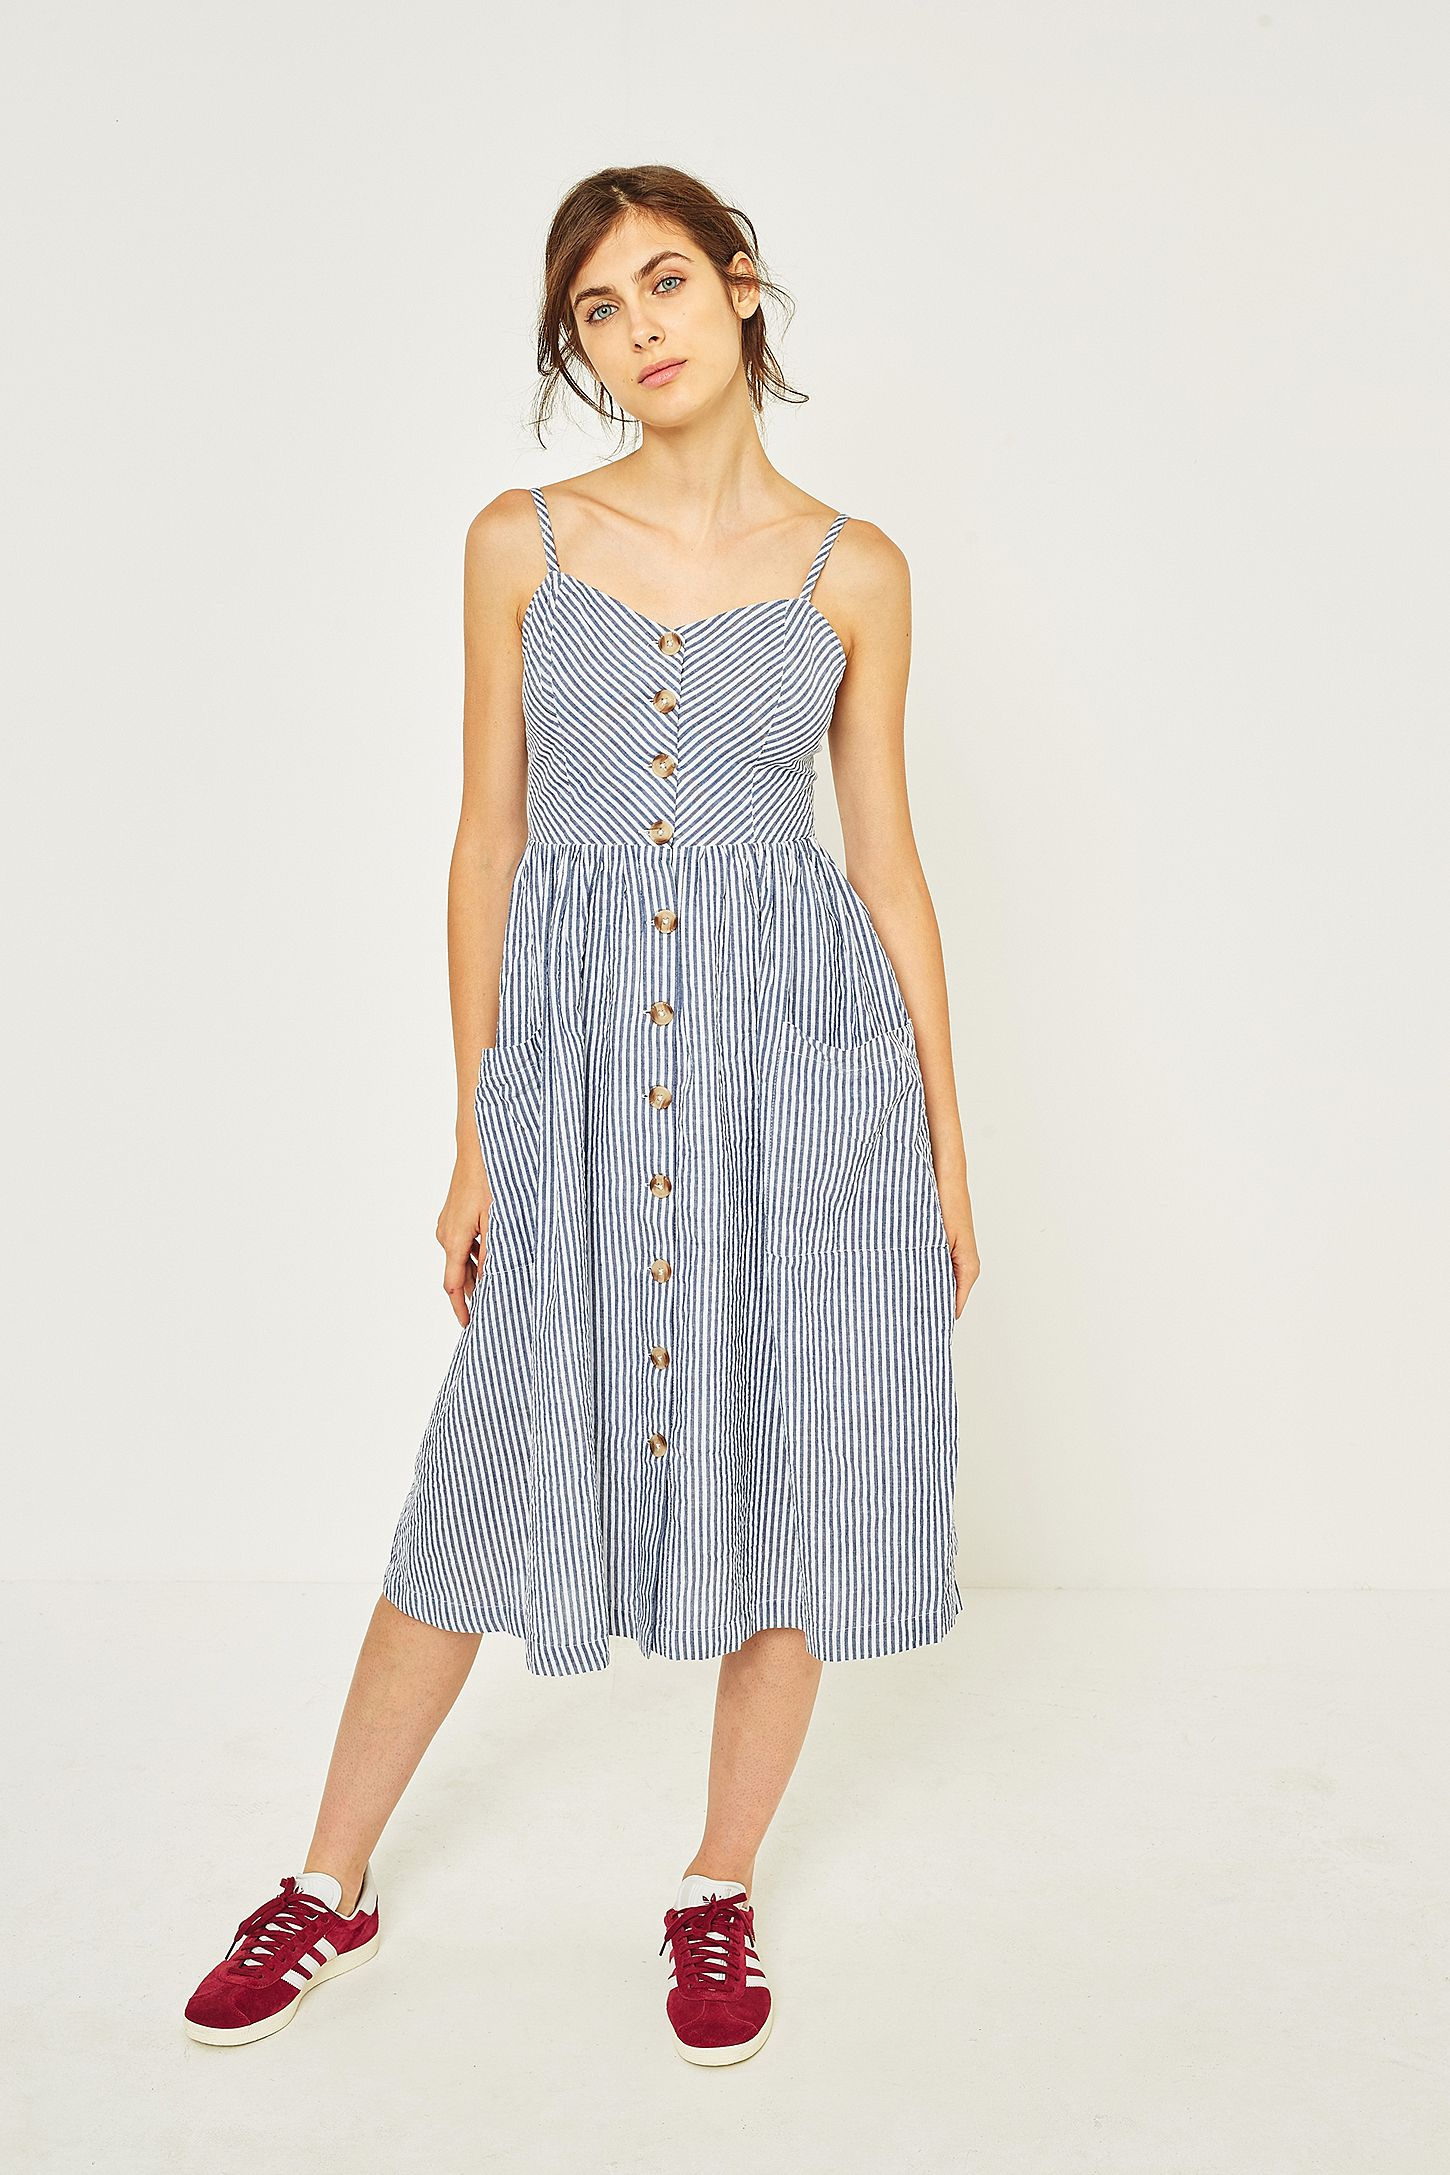 e9da4d4872 Kimchi Blue Emilia Seersucker Linen Button-Down Midi Dress. Click on image  to zoom. Hover to zoom. Double Tap to Zoom